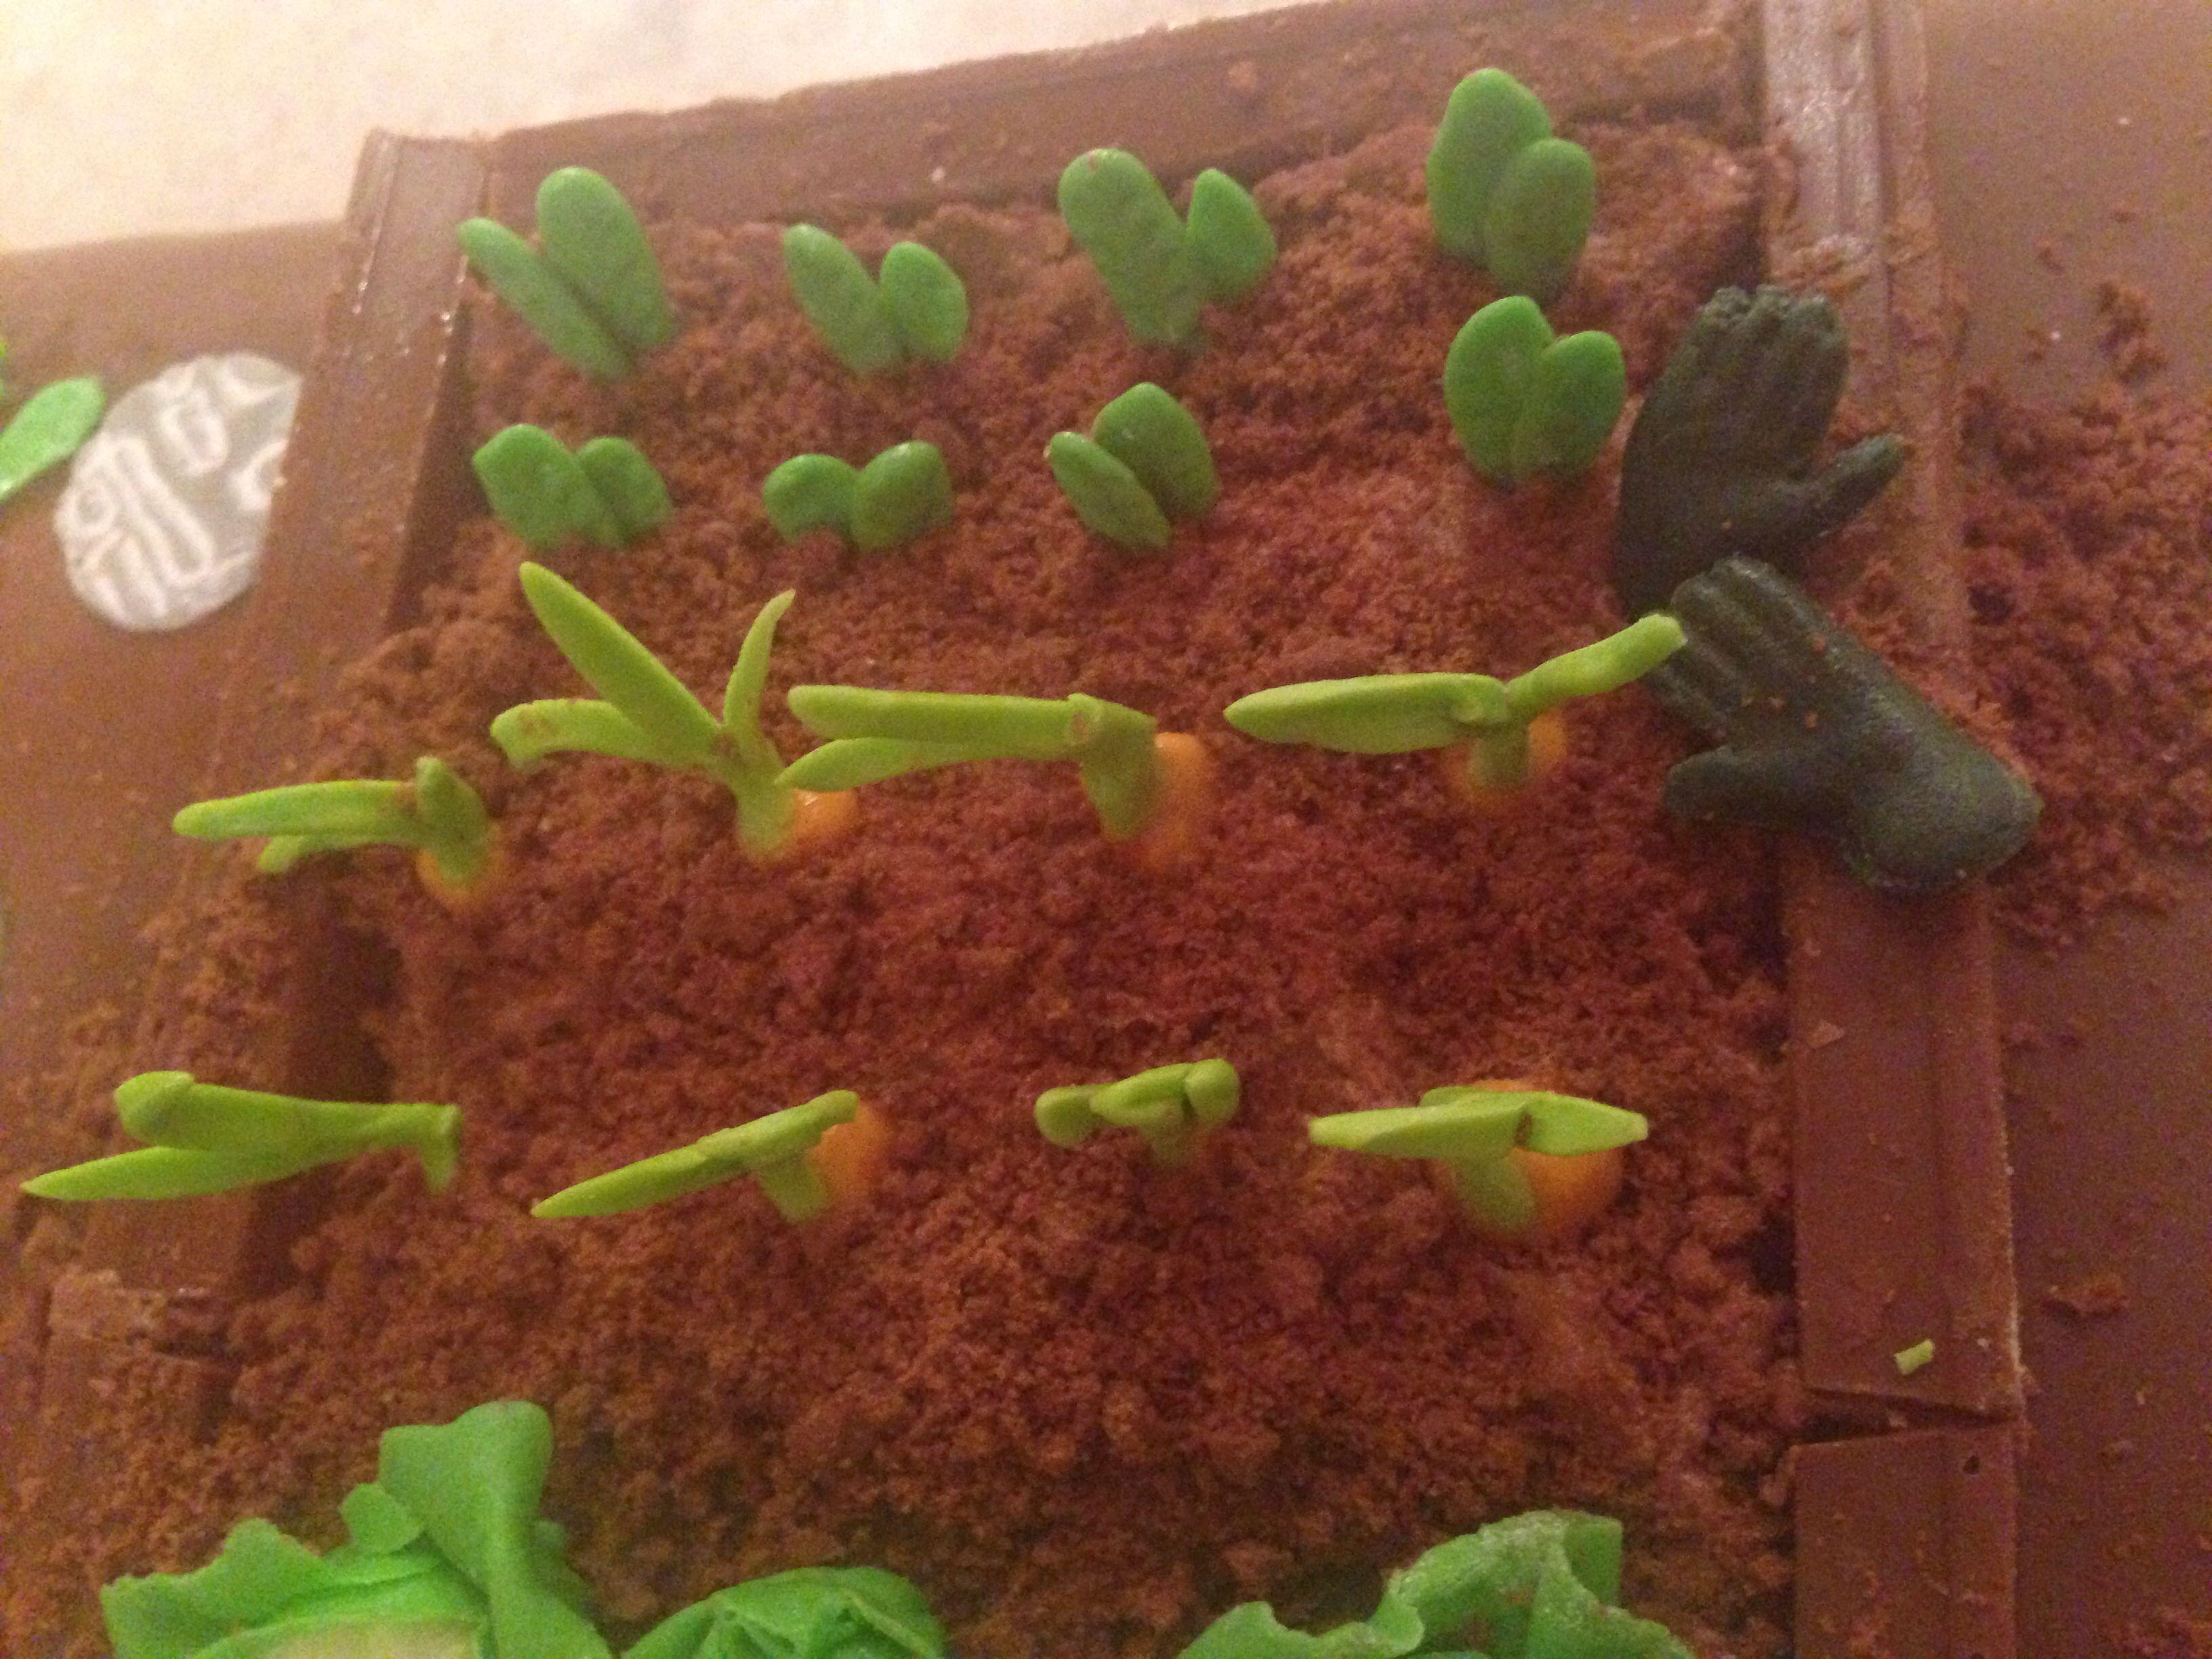 My fondant vegetables and fondant gardening gloves | My cakes ...